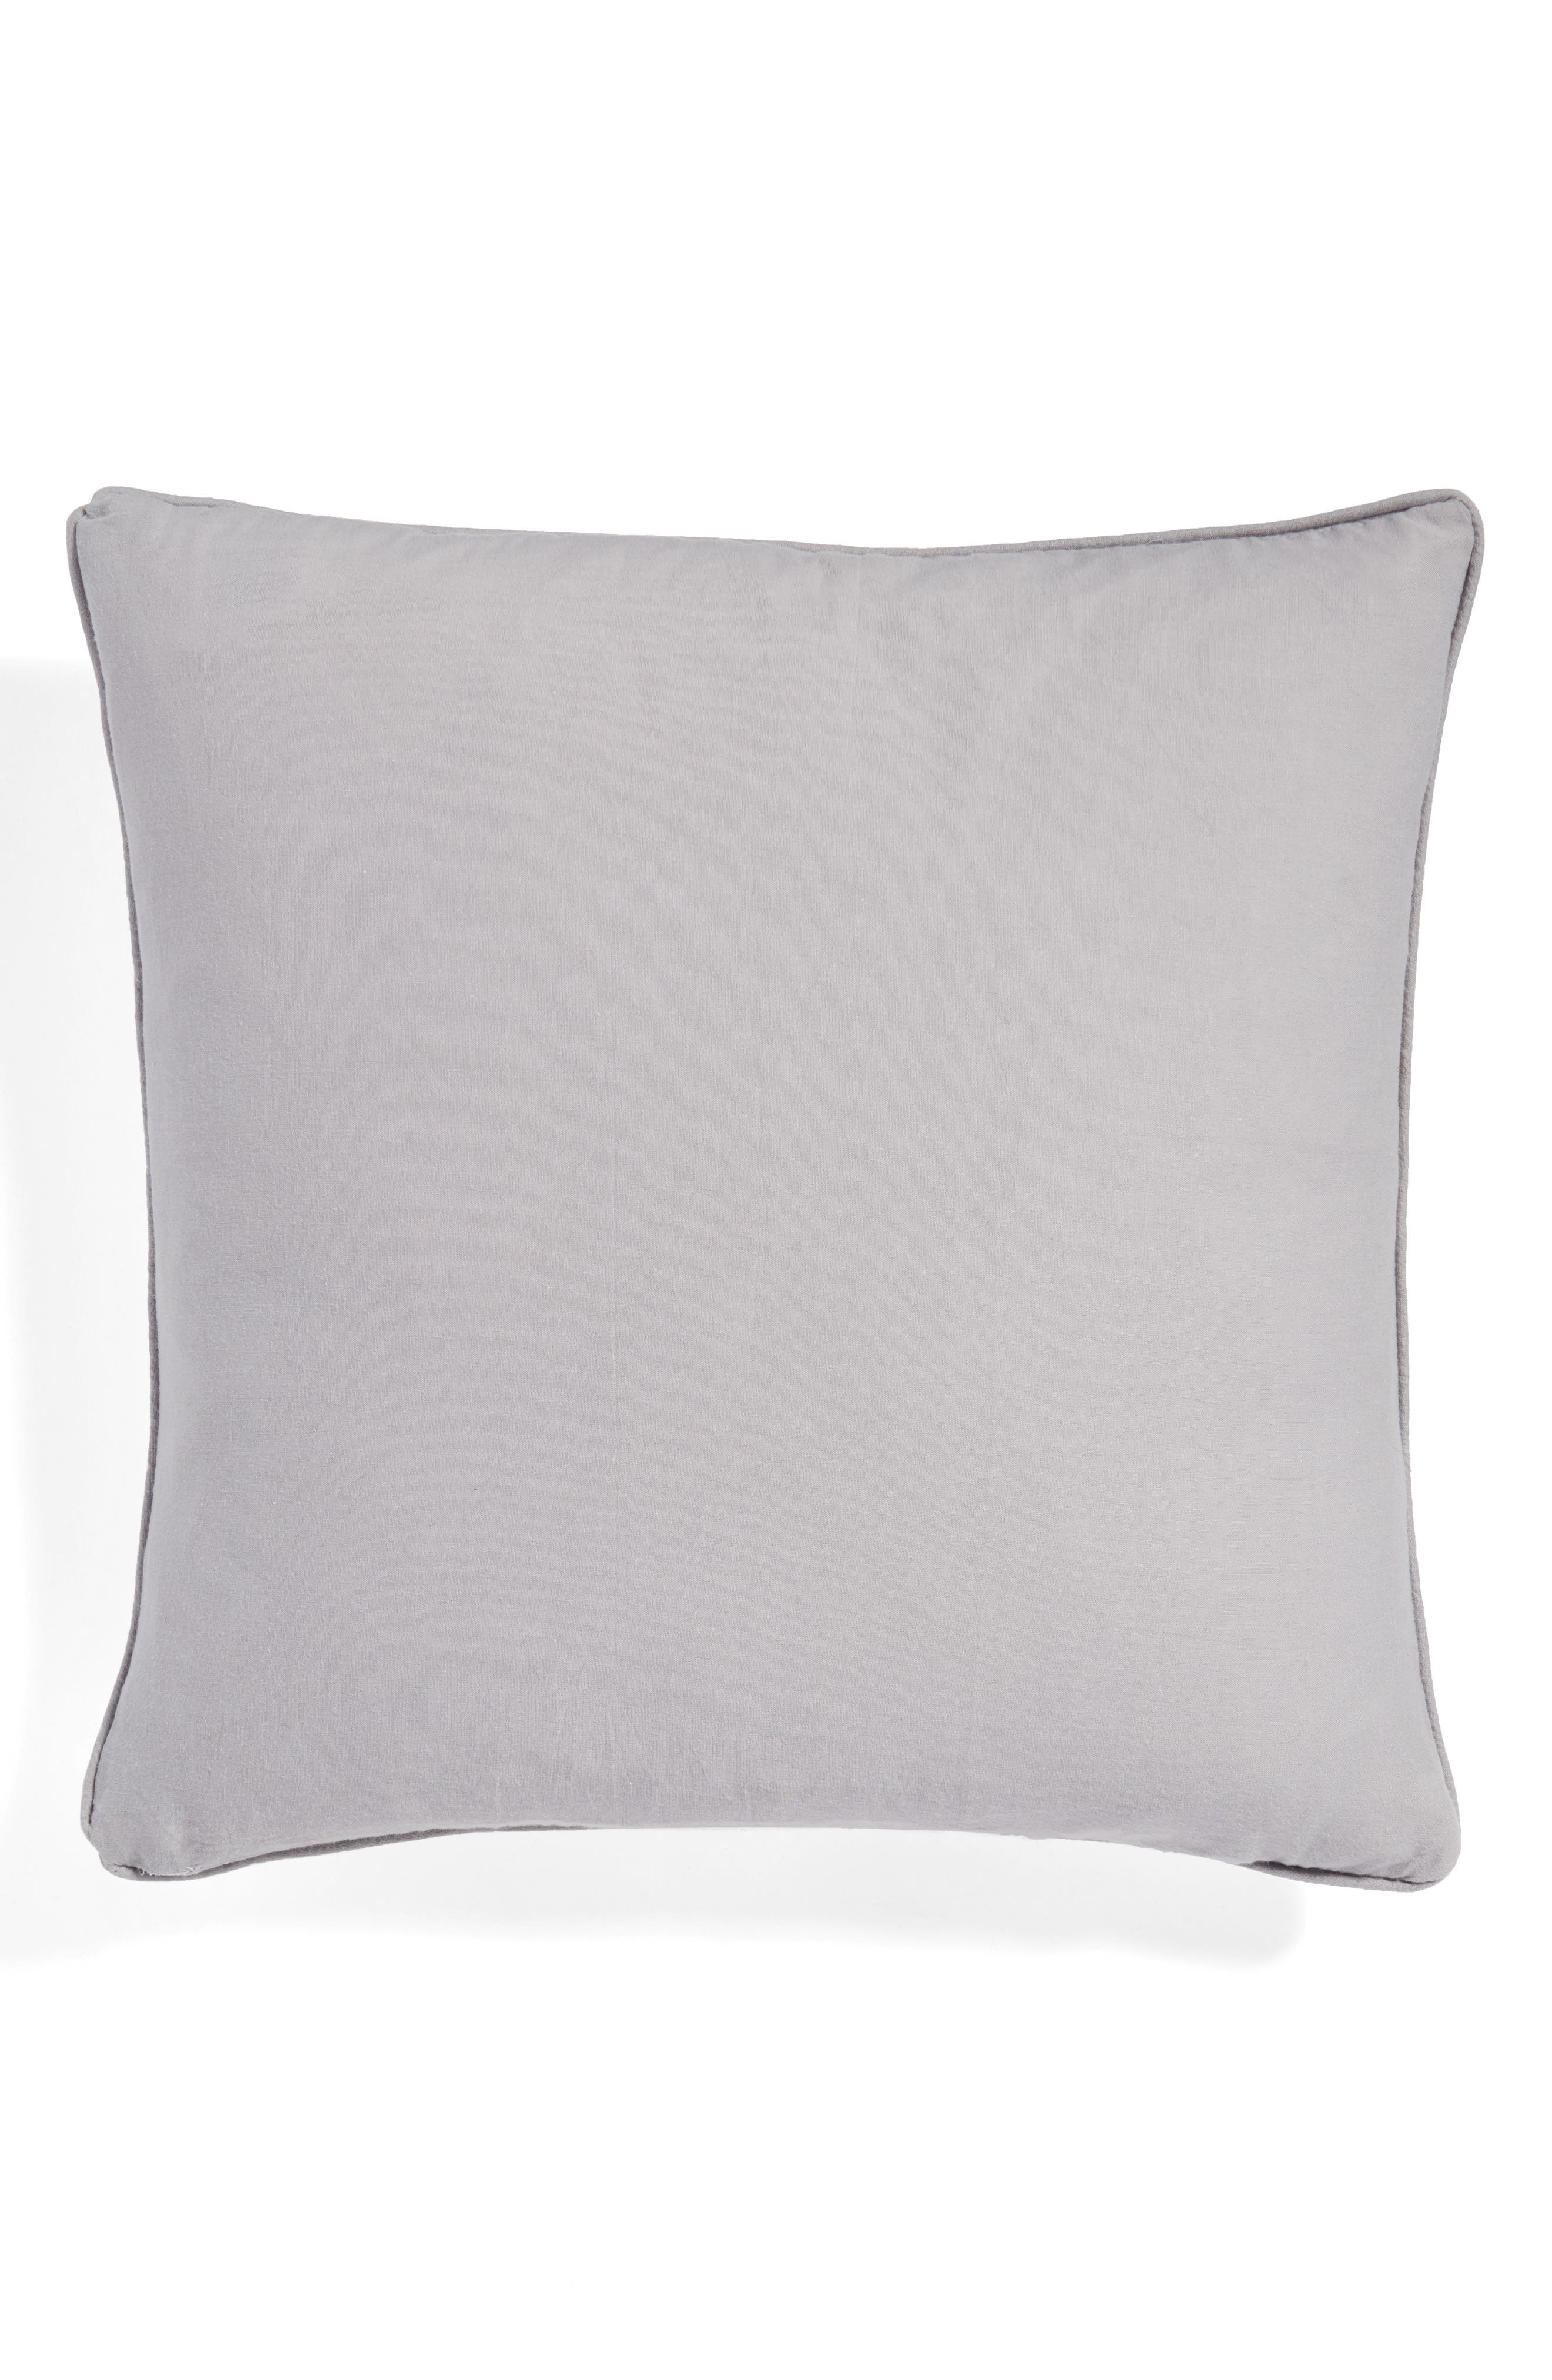 Sequin Reindeer Pillow,                             Alternate thumbnail 2, color,                             100